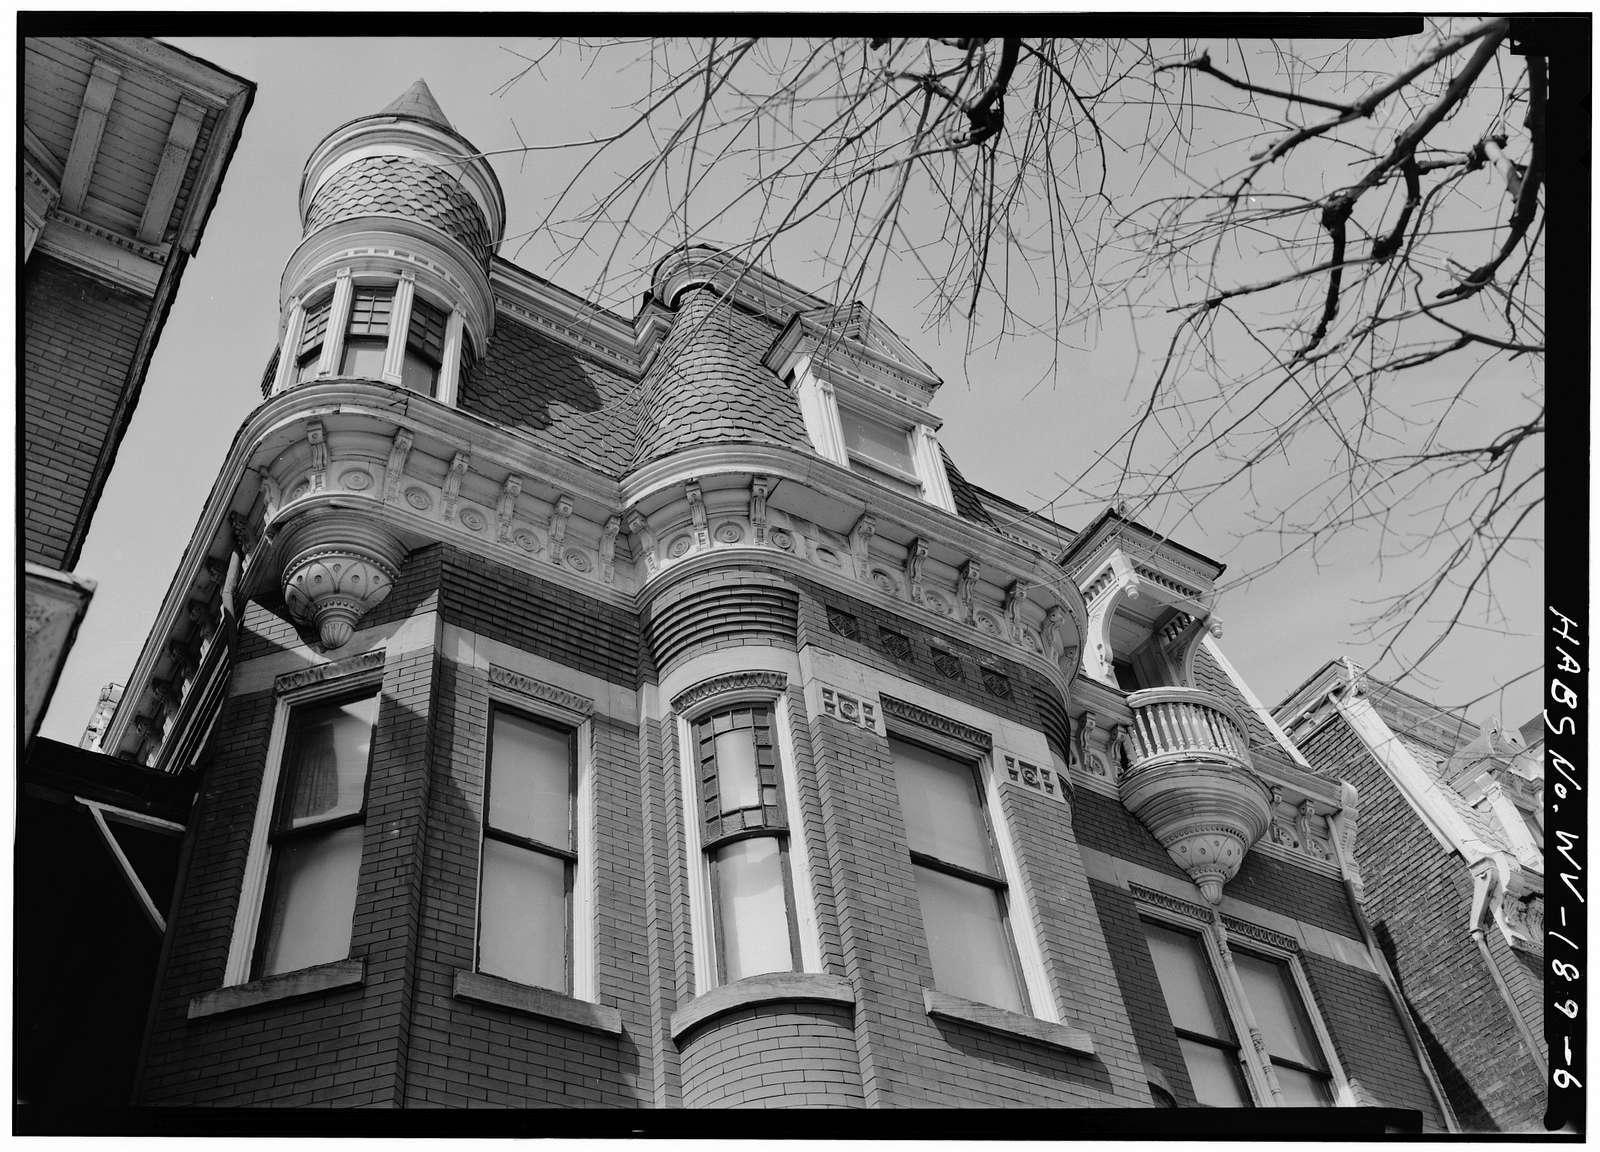 Gregor Ackermann House, 2319 Chapline Street, Wheeling, Ohio County, WV